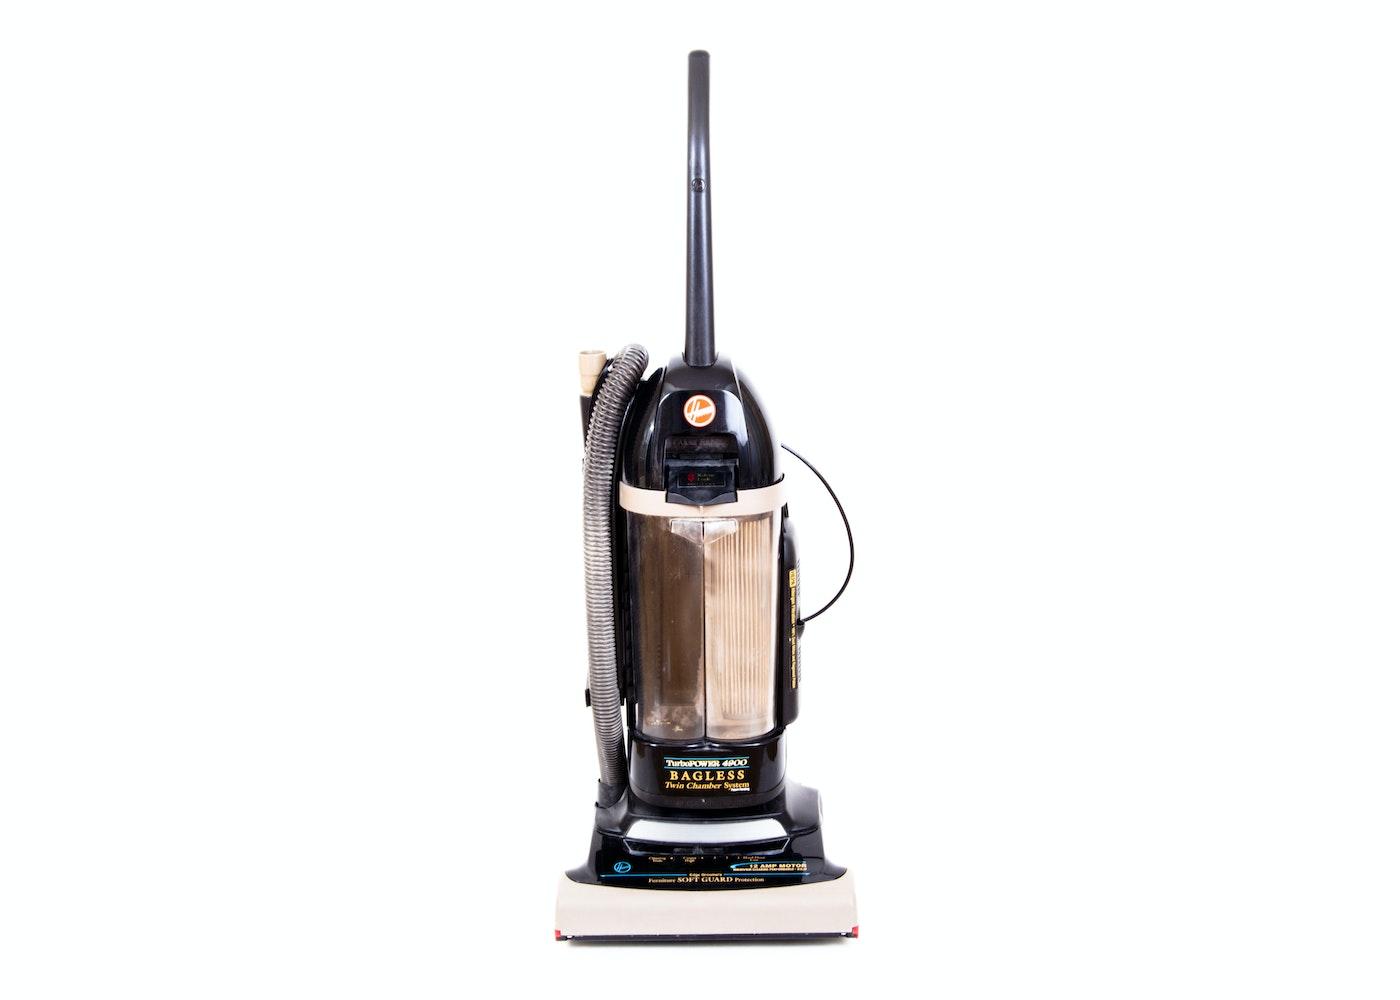 Hoover Turbopower 4900 Upright Vacuum Cleaner Ebth